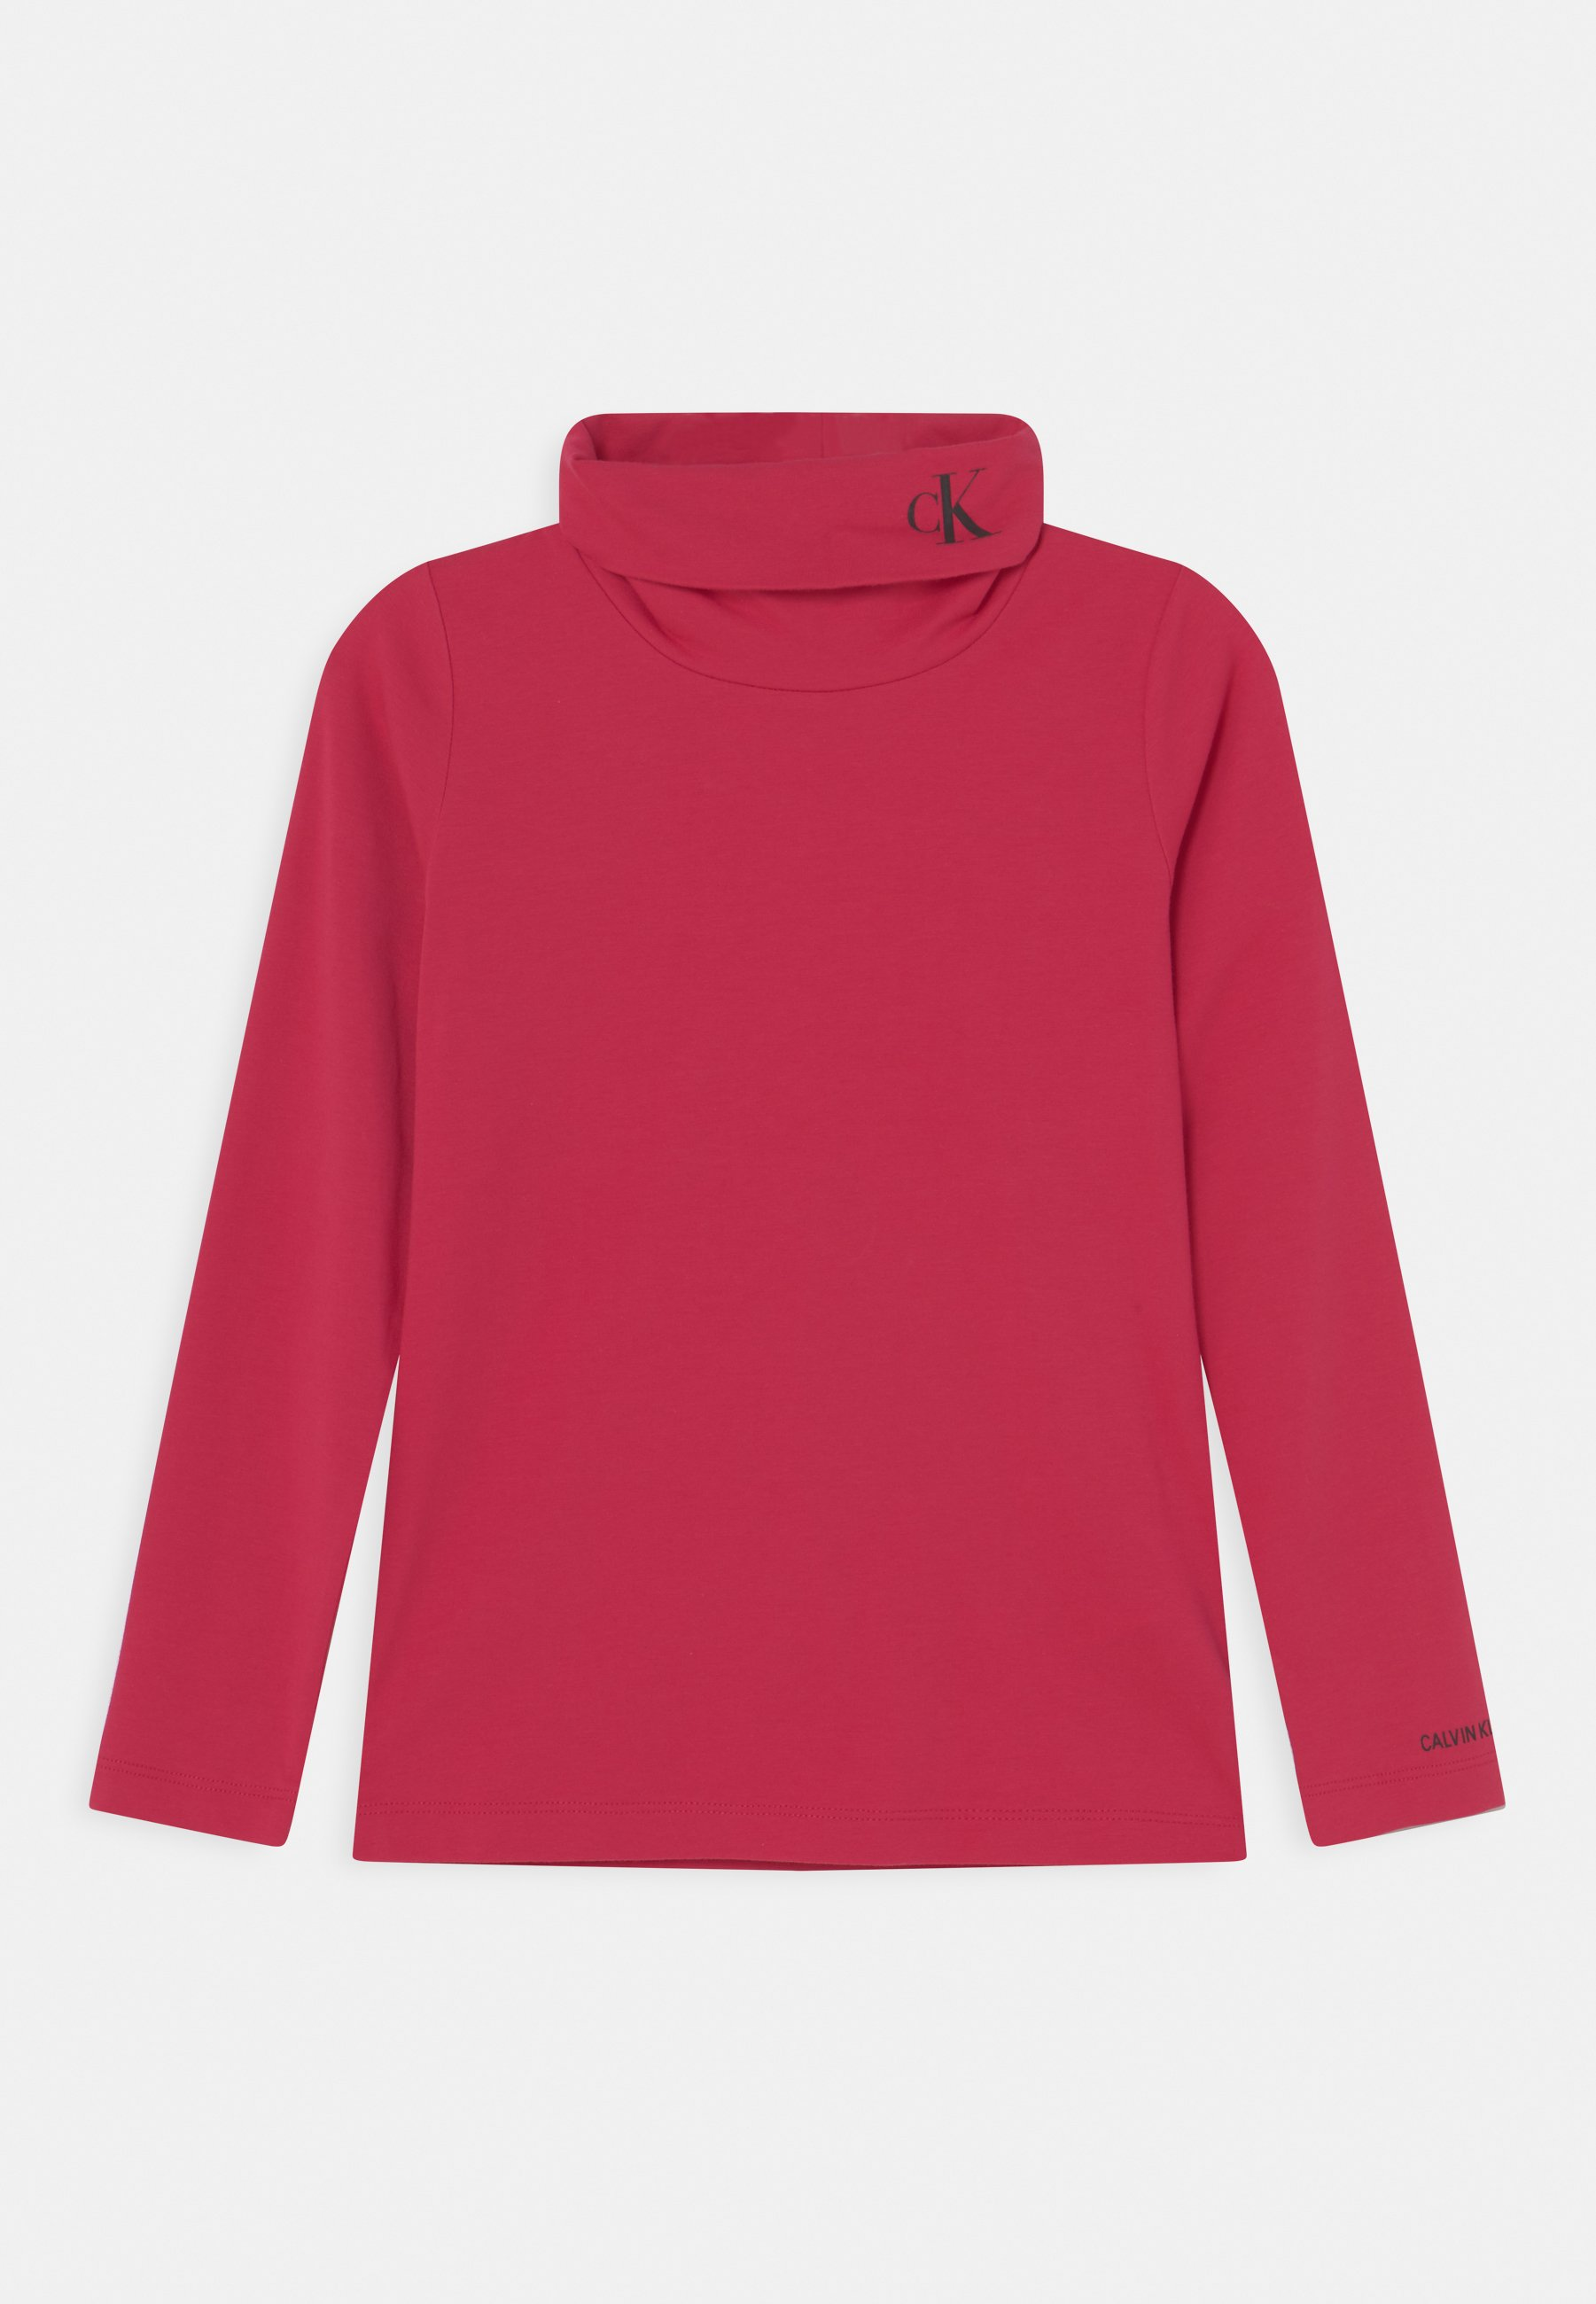 Kids MONOGRAM ROLL NECK - Long sleeved top